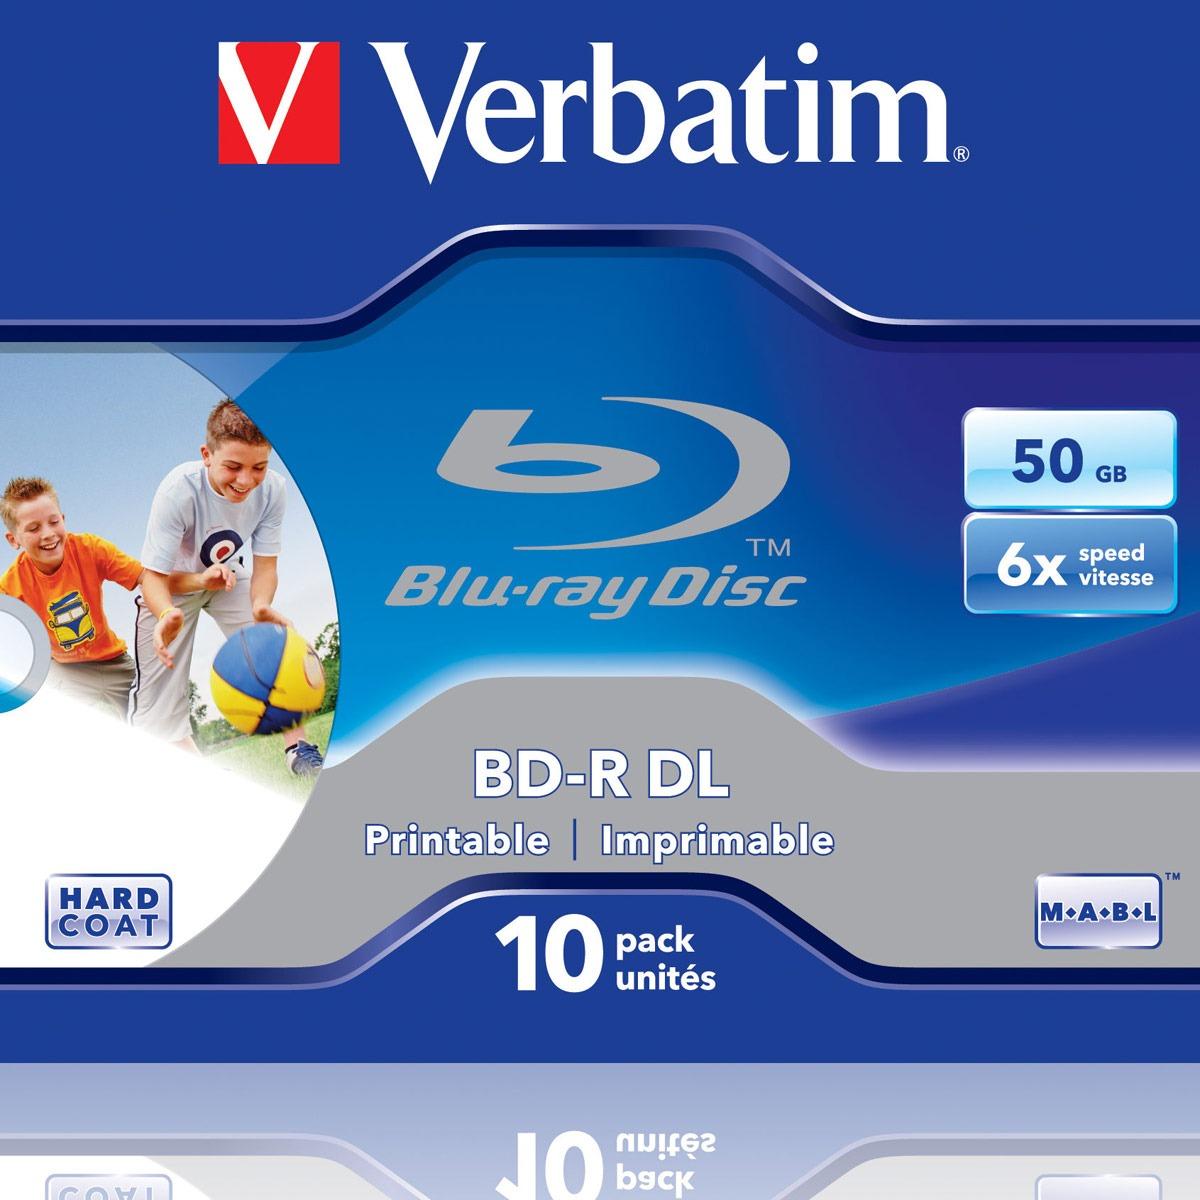 Blu-ray Verbatim BD-R DL 50 Go 6x imprimable (par 10, boîte) Verbatim BD-R DL 50 Go certifié 6x imprimable (pack de 10, boîtier standard)